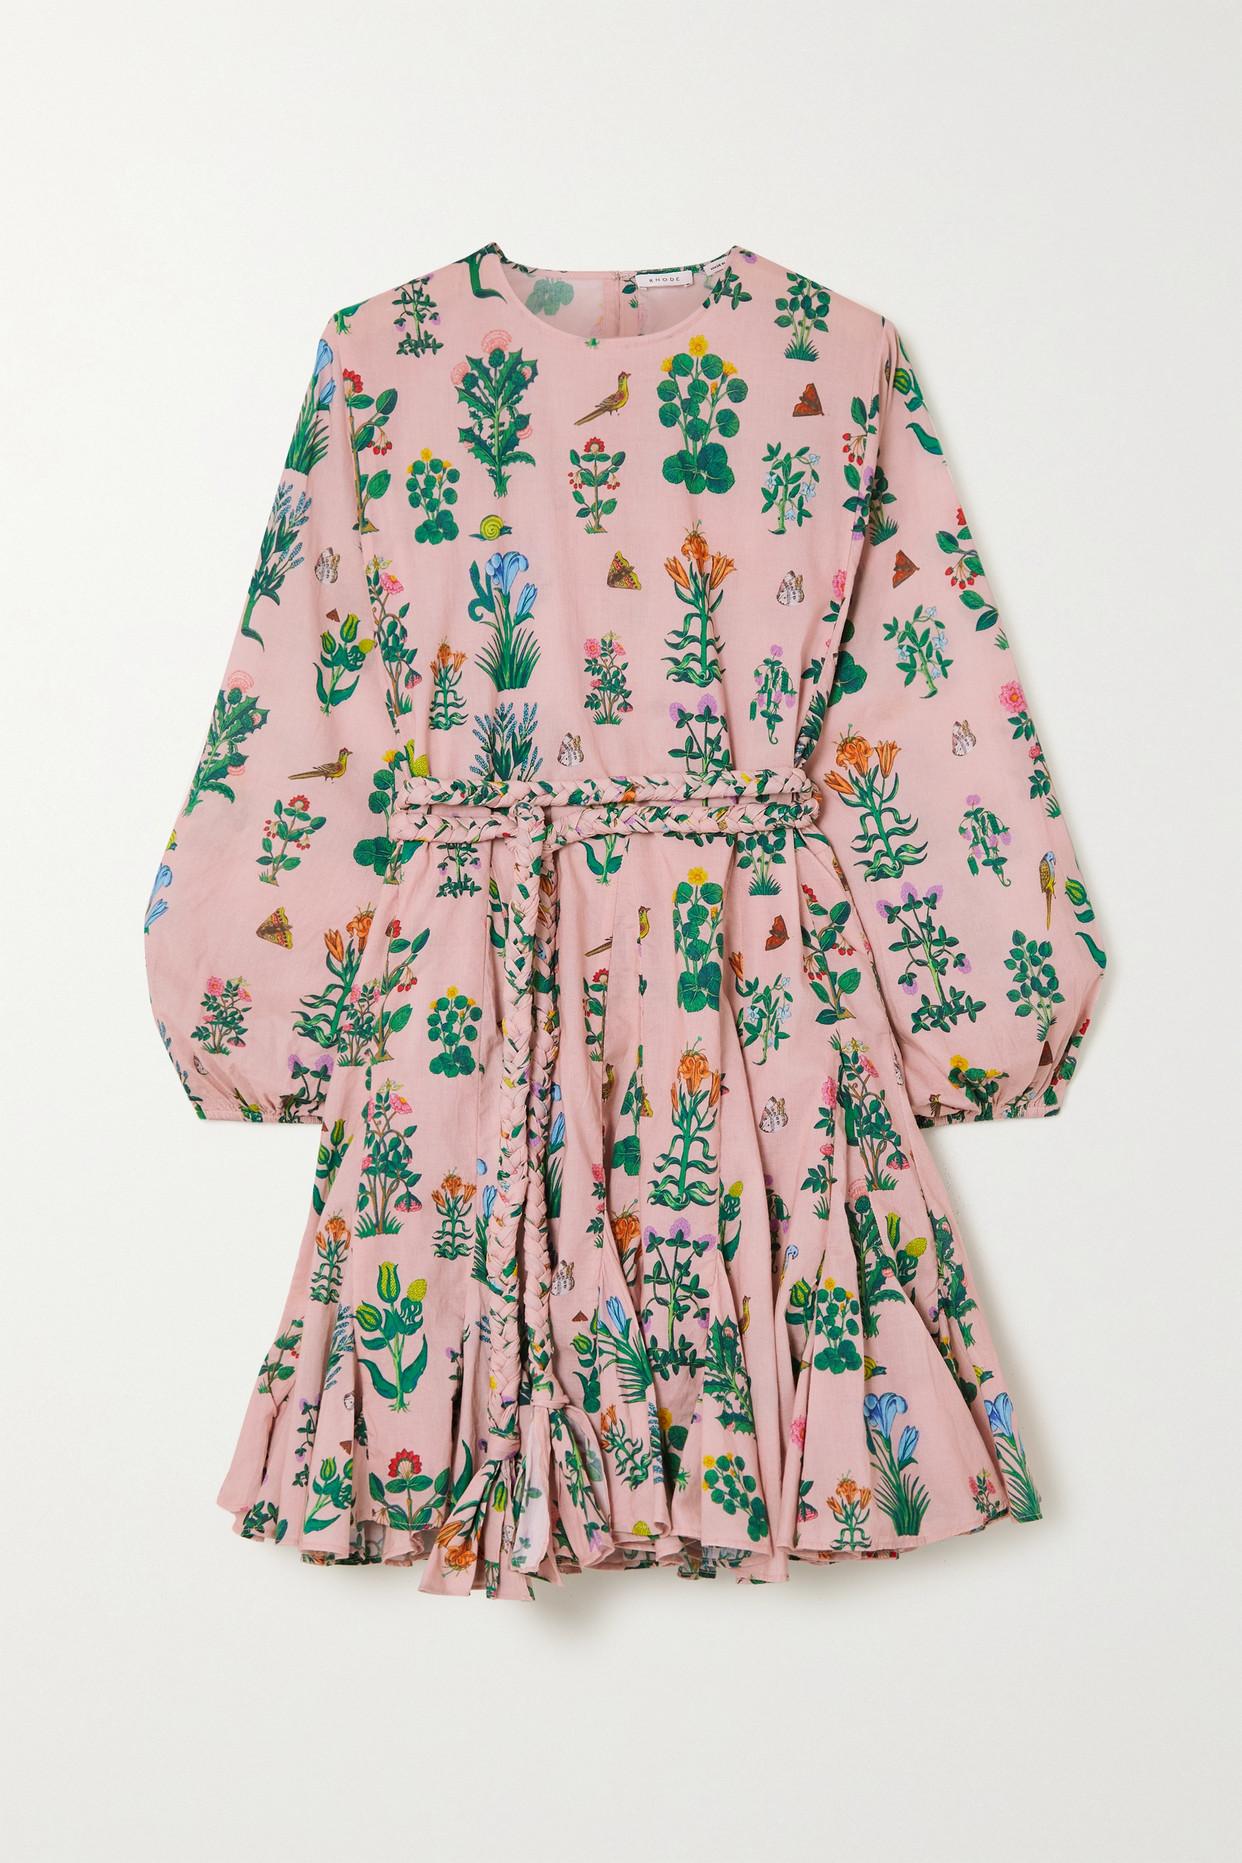 RHODE - Ella Belted Floral-print Cotton-voile Mini Dress - Pink - large